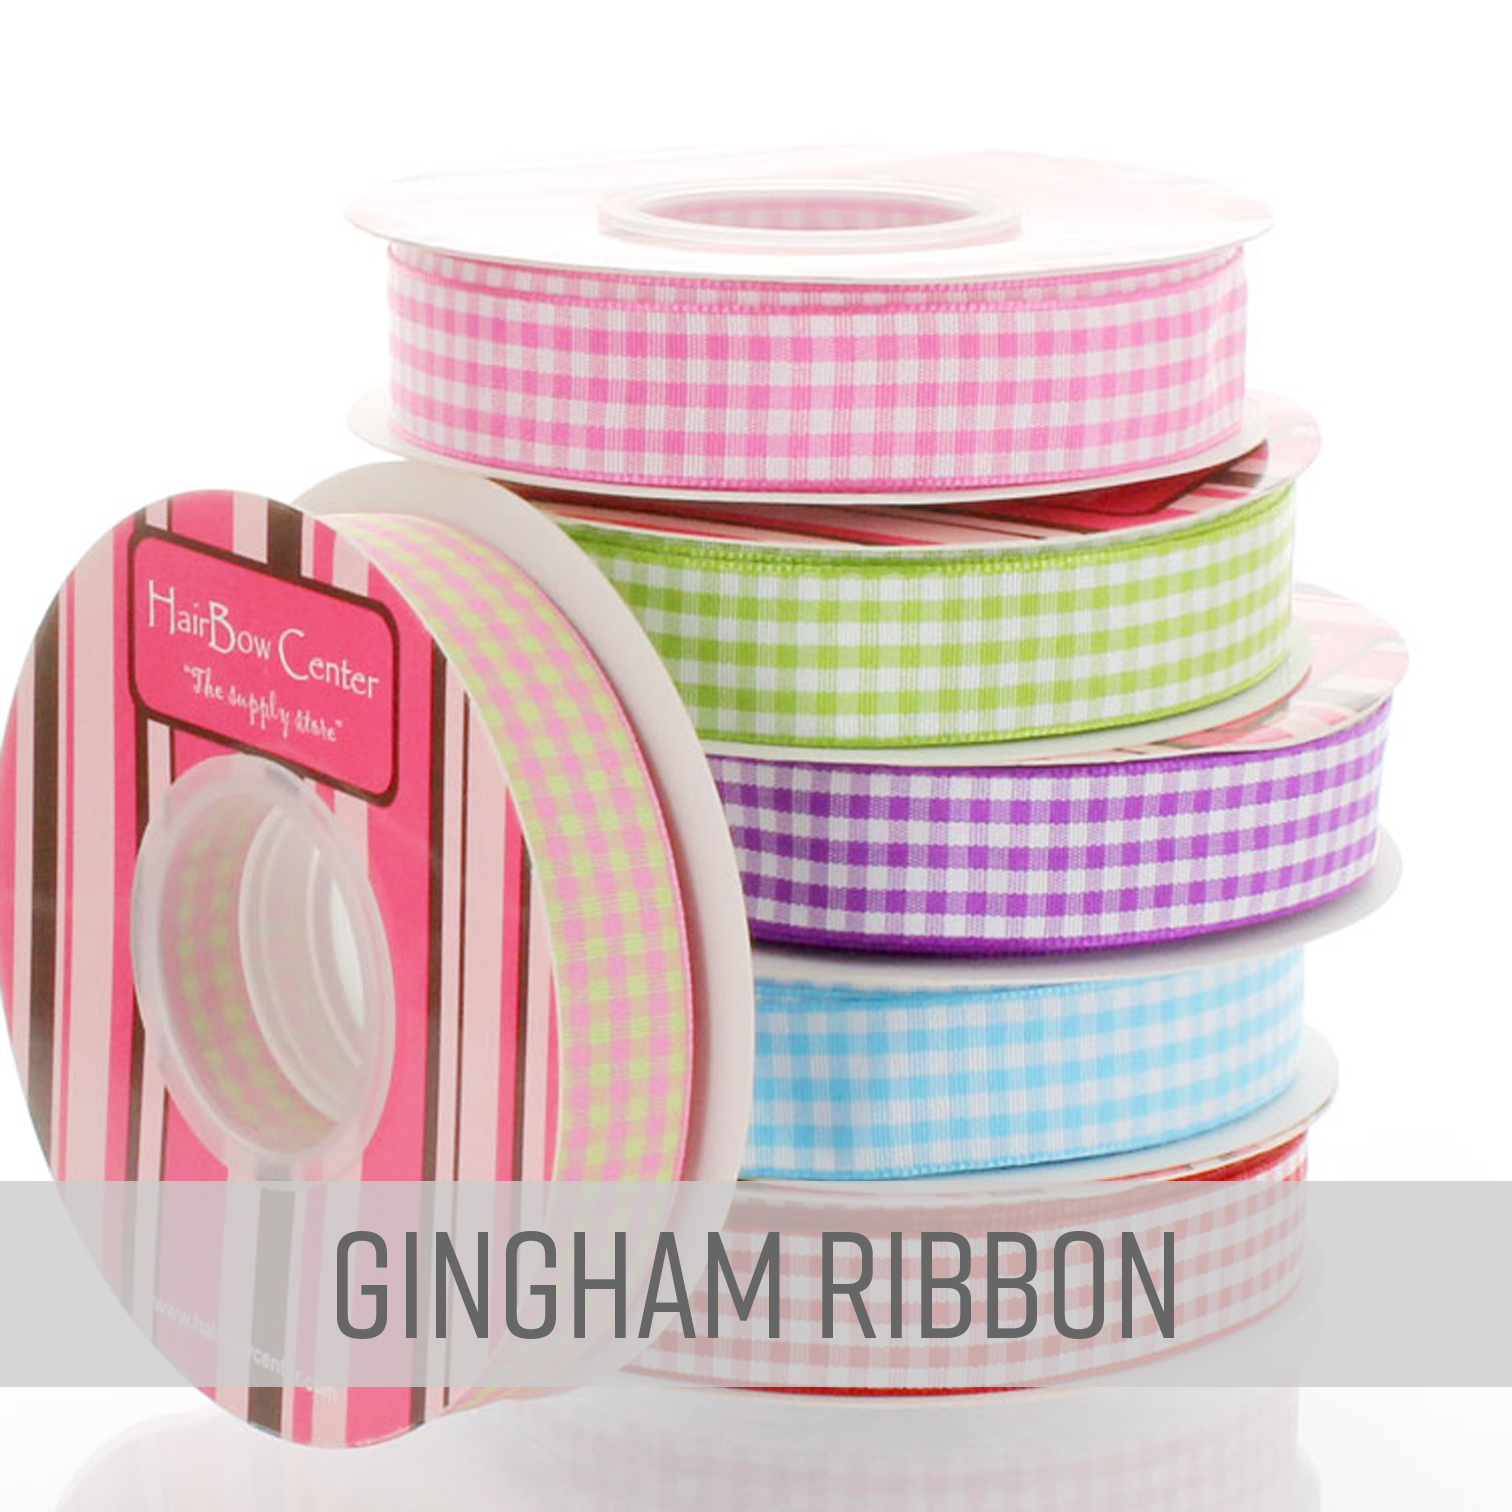 Gingham Ribbon